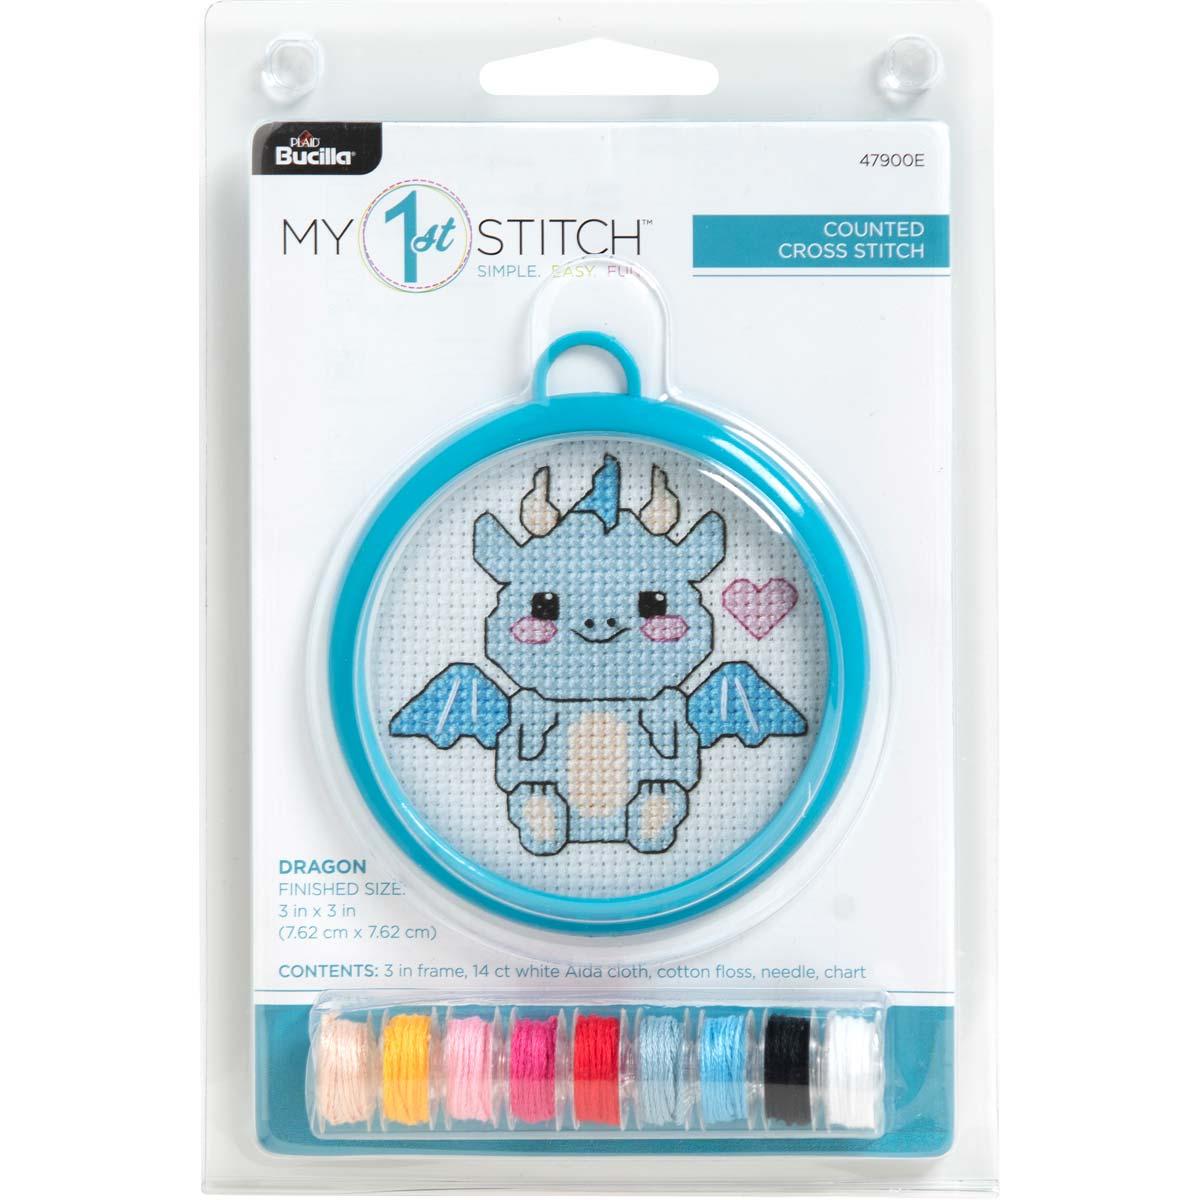 Bucilla ® My 1st Stitch™ - Counted Cross Stitch Kits - Mini - Dragon - 47900E